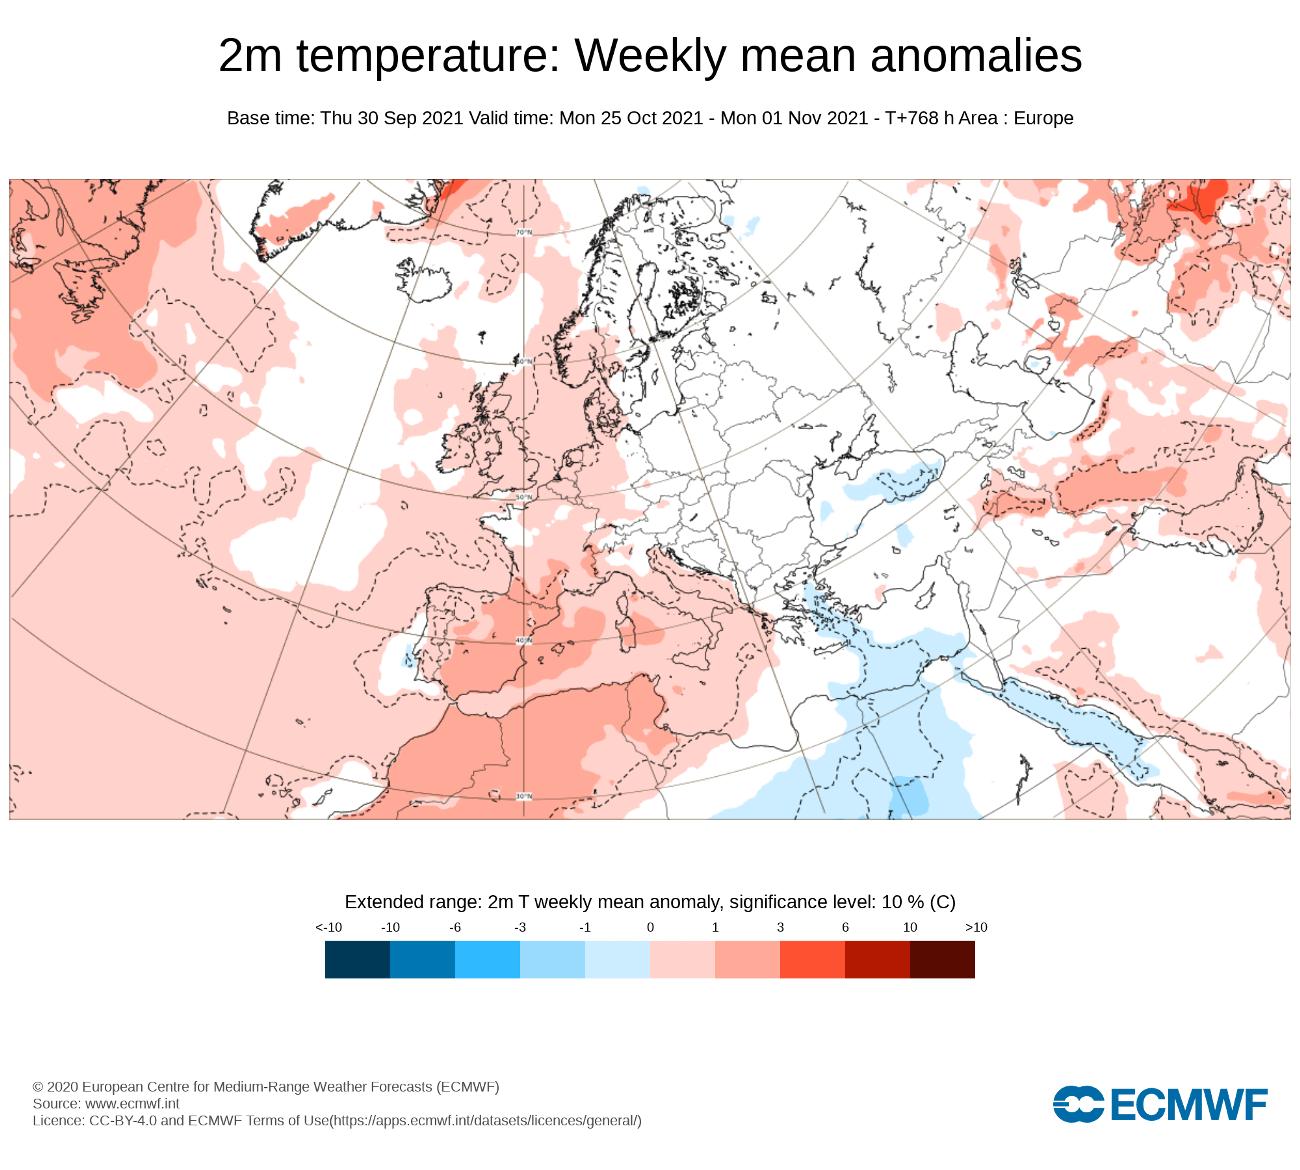 october-weather-forecast-ecmwf-week-4-europe-temperature